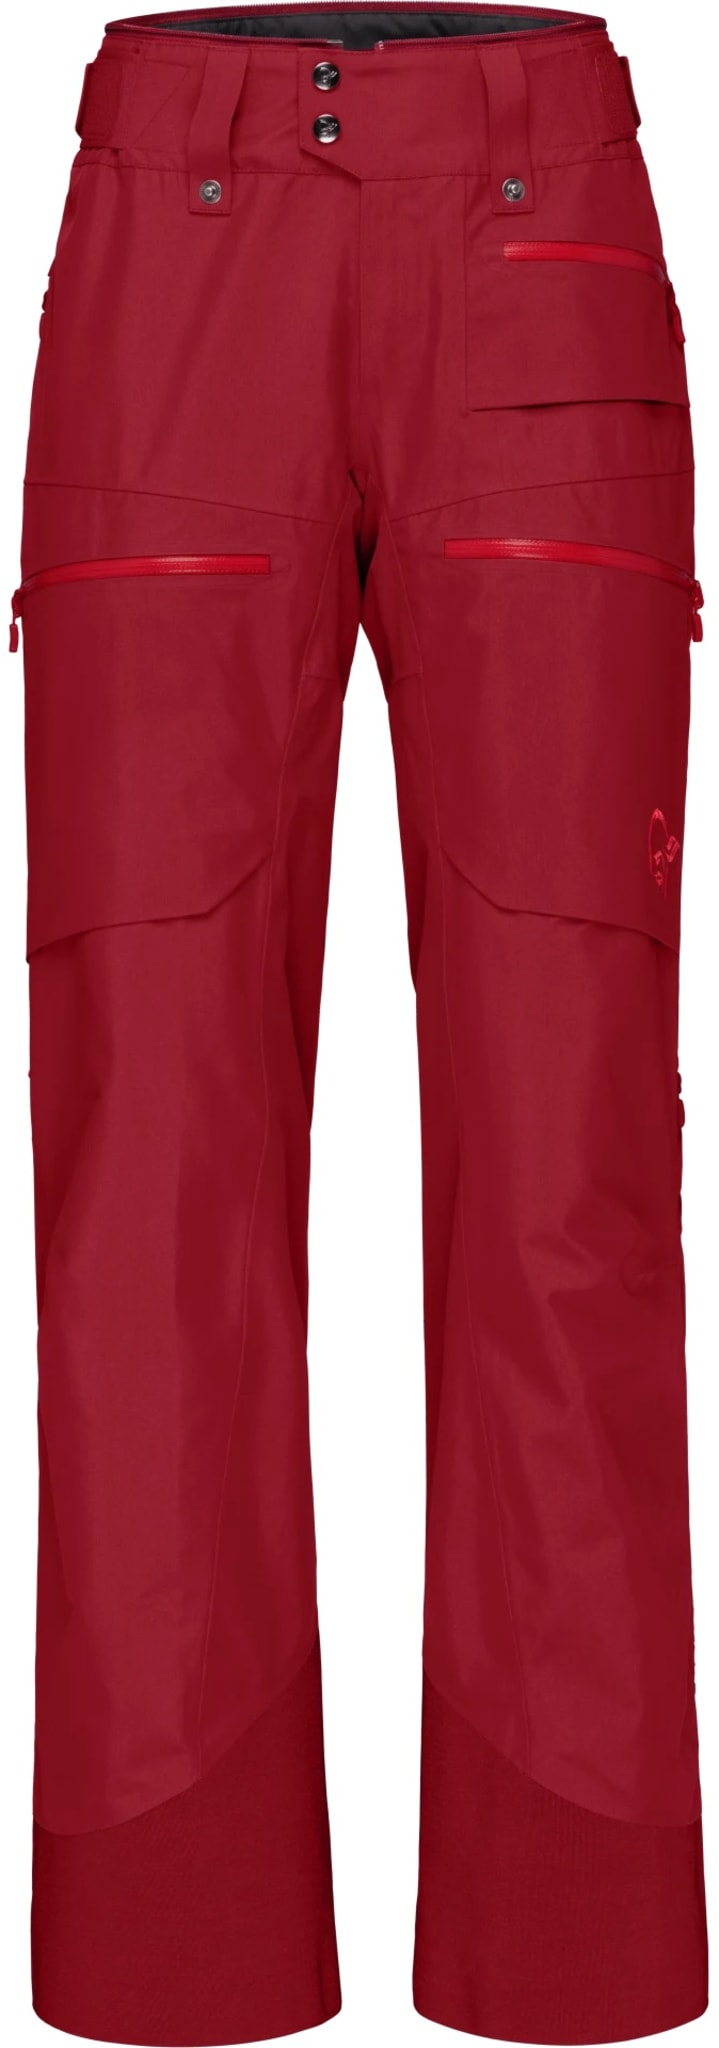 Lofoten Gore-Tex insulated Pant W